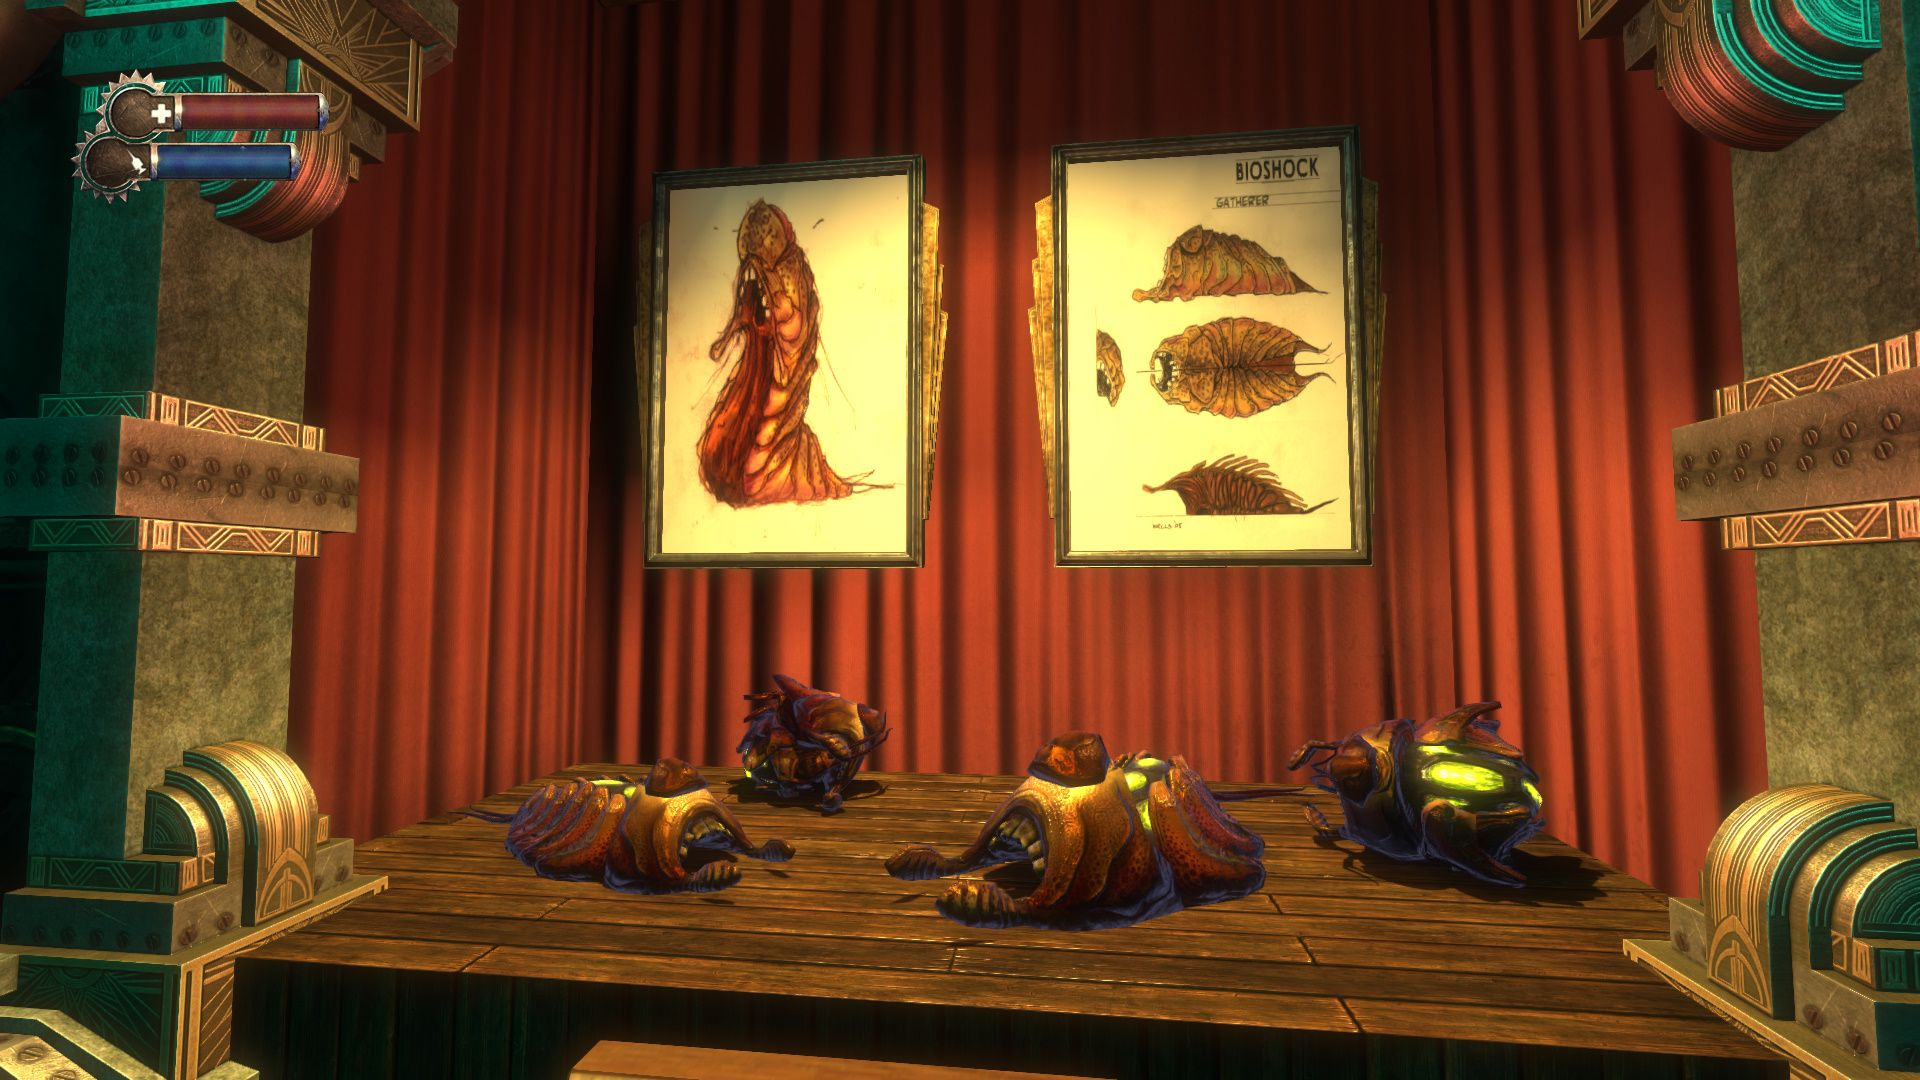 Pin by Artur Grinn on BioShock Remastered Bioshock